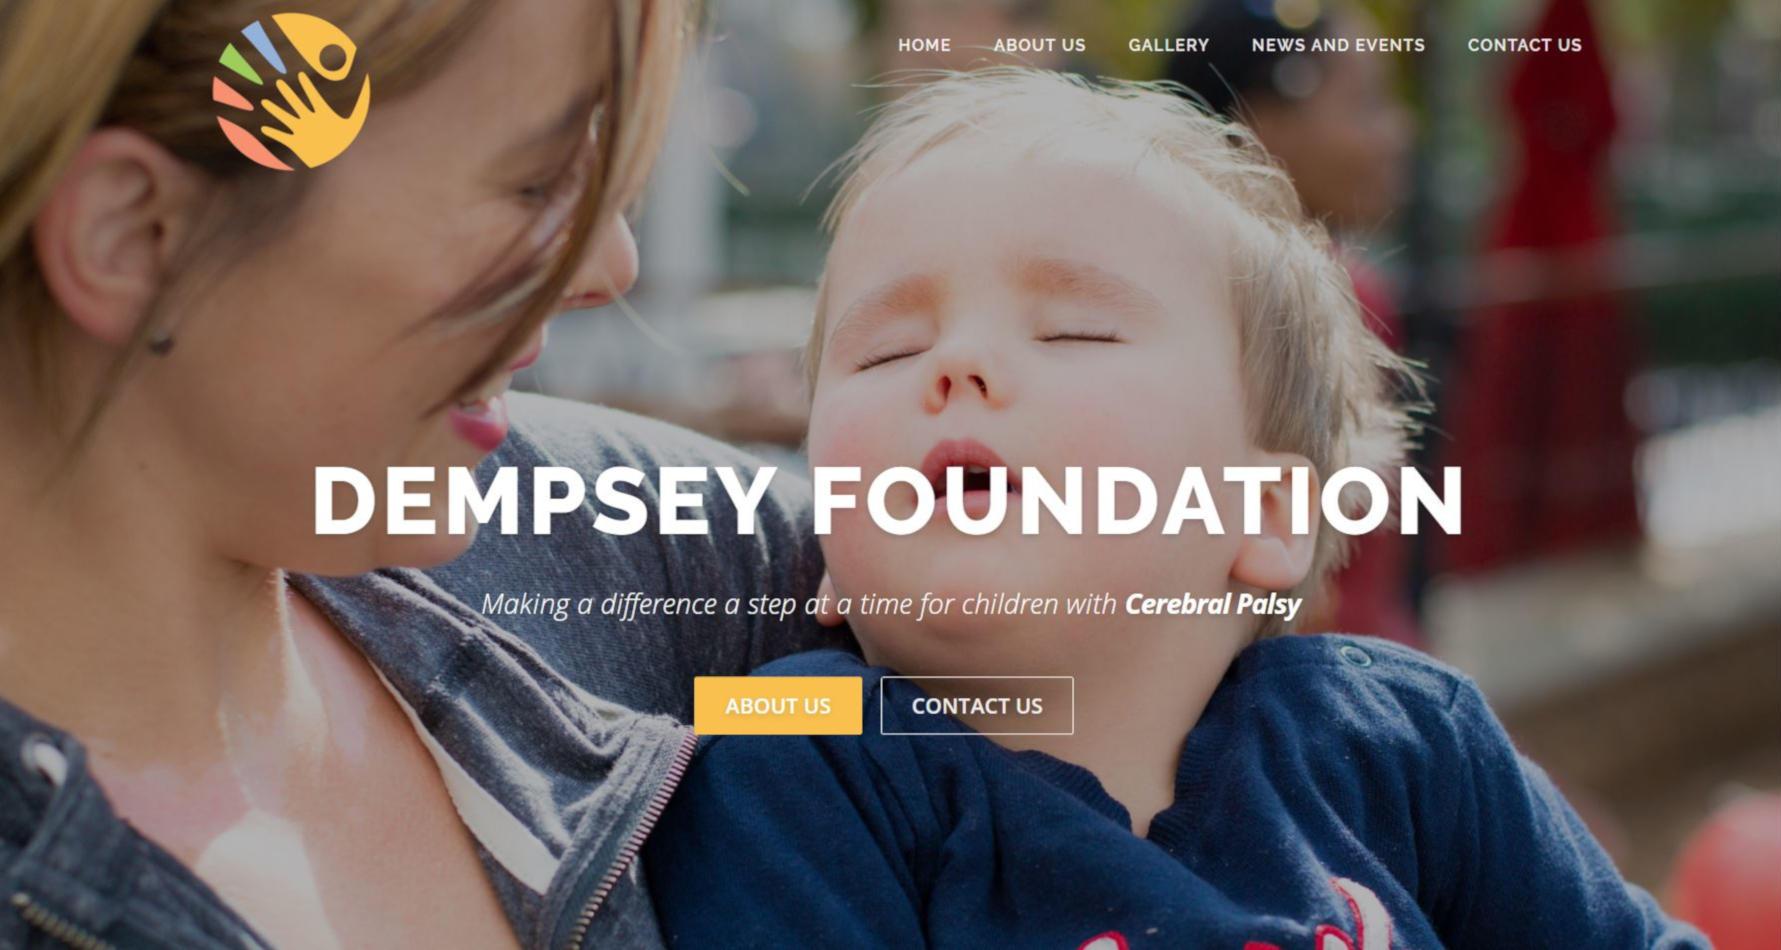 Dempsey Foundation